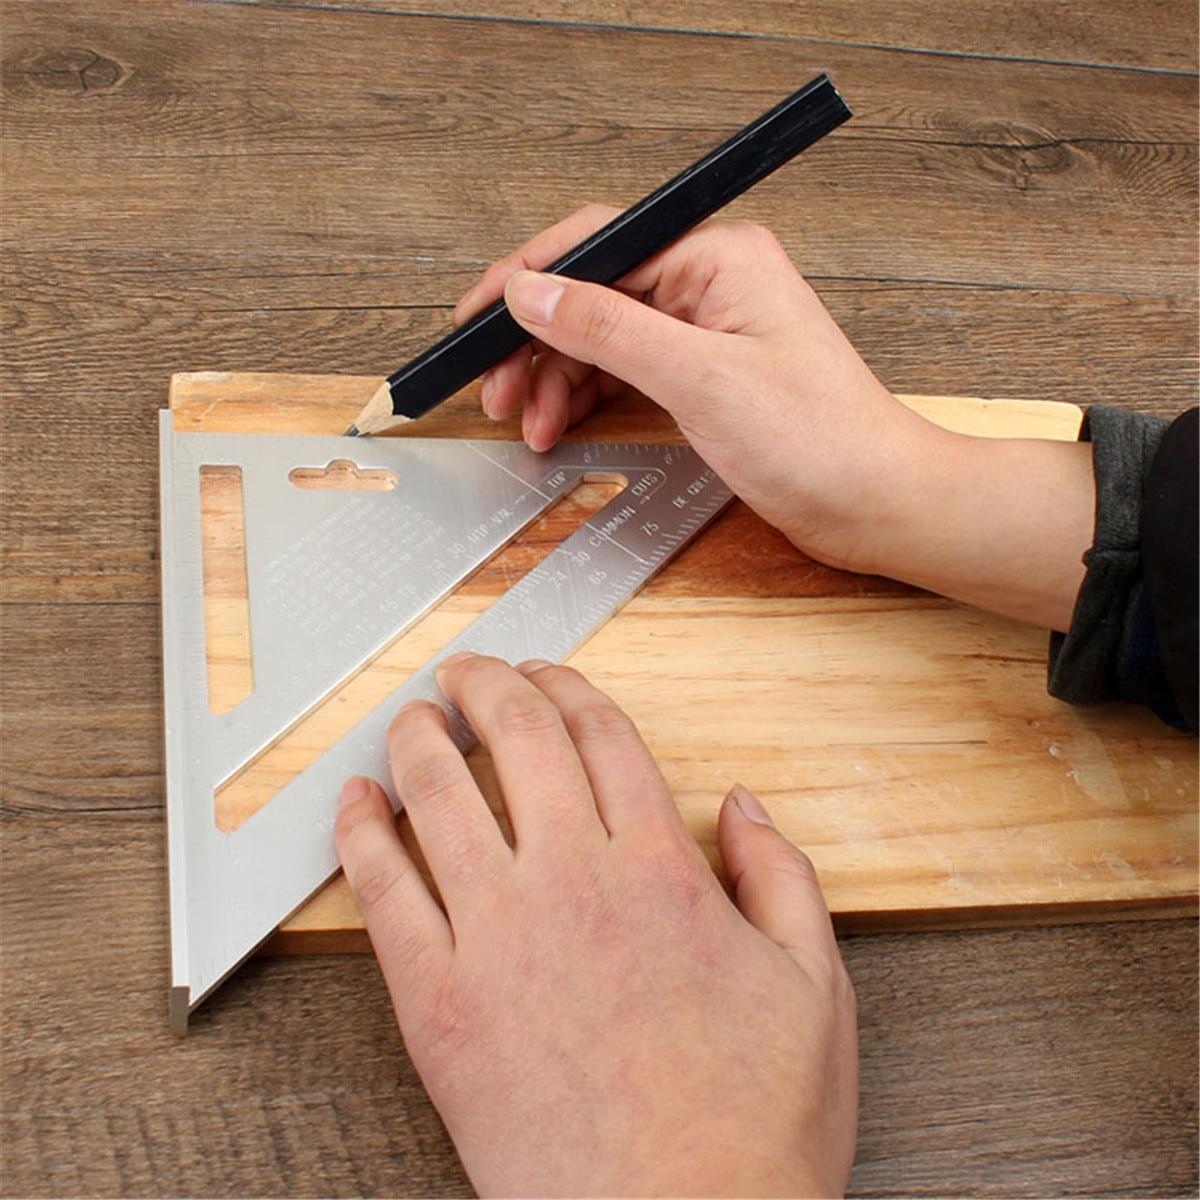 JIGUOOR Multi-Usage 200mm Alloy Speed Square Protractor Miter Framing Tri-square Line Scriber Saw Guide Measurement Carpenter